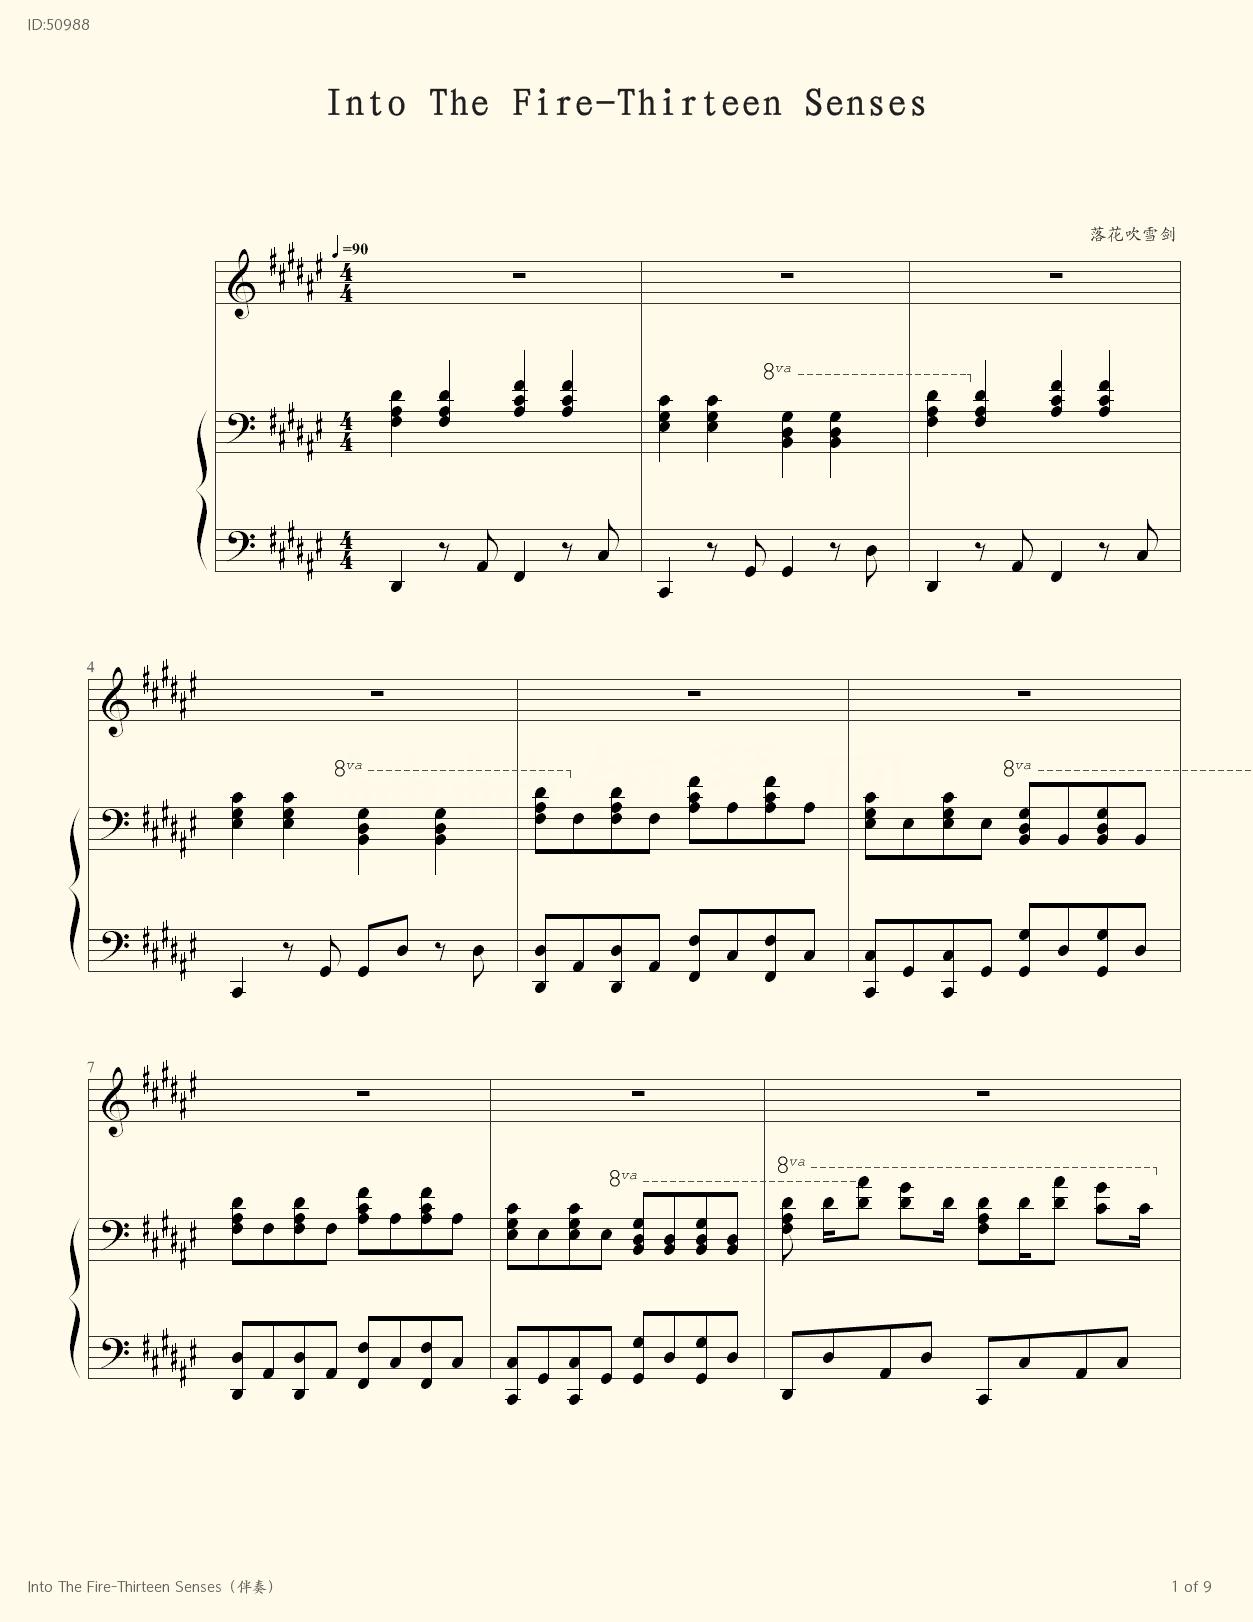 musica thirteen senses - into the fire